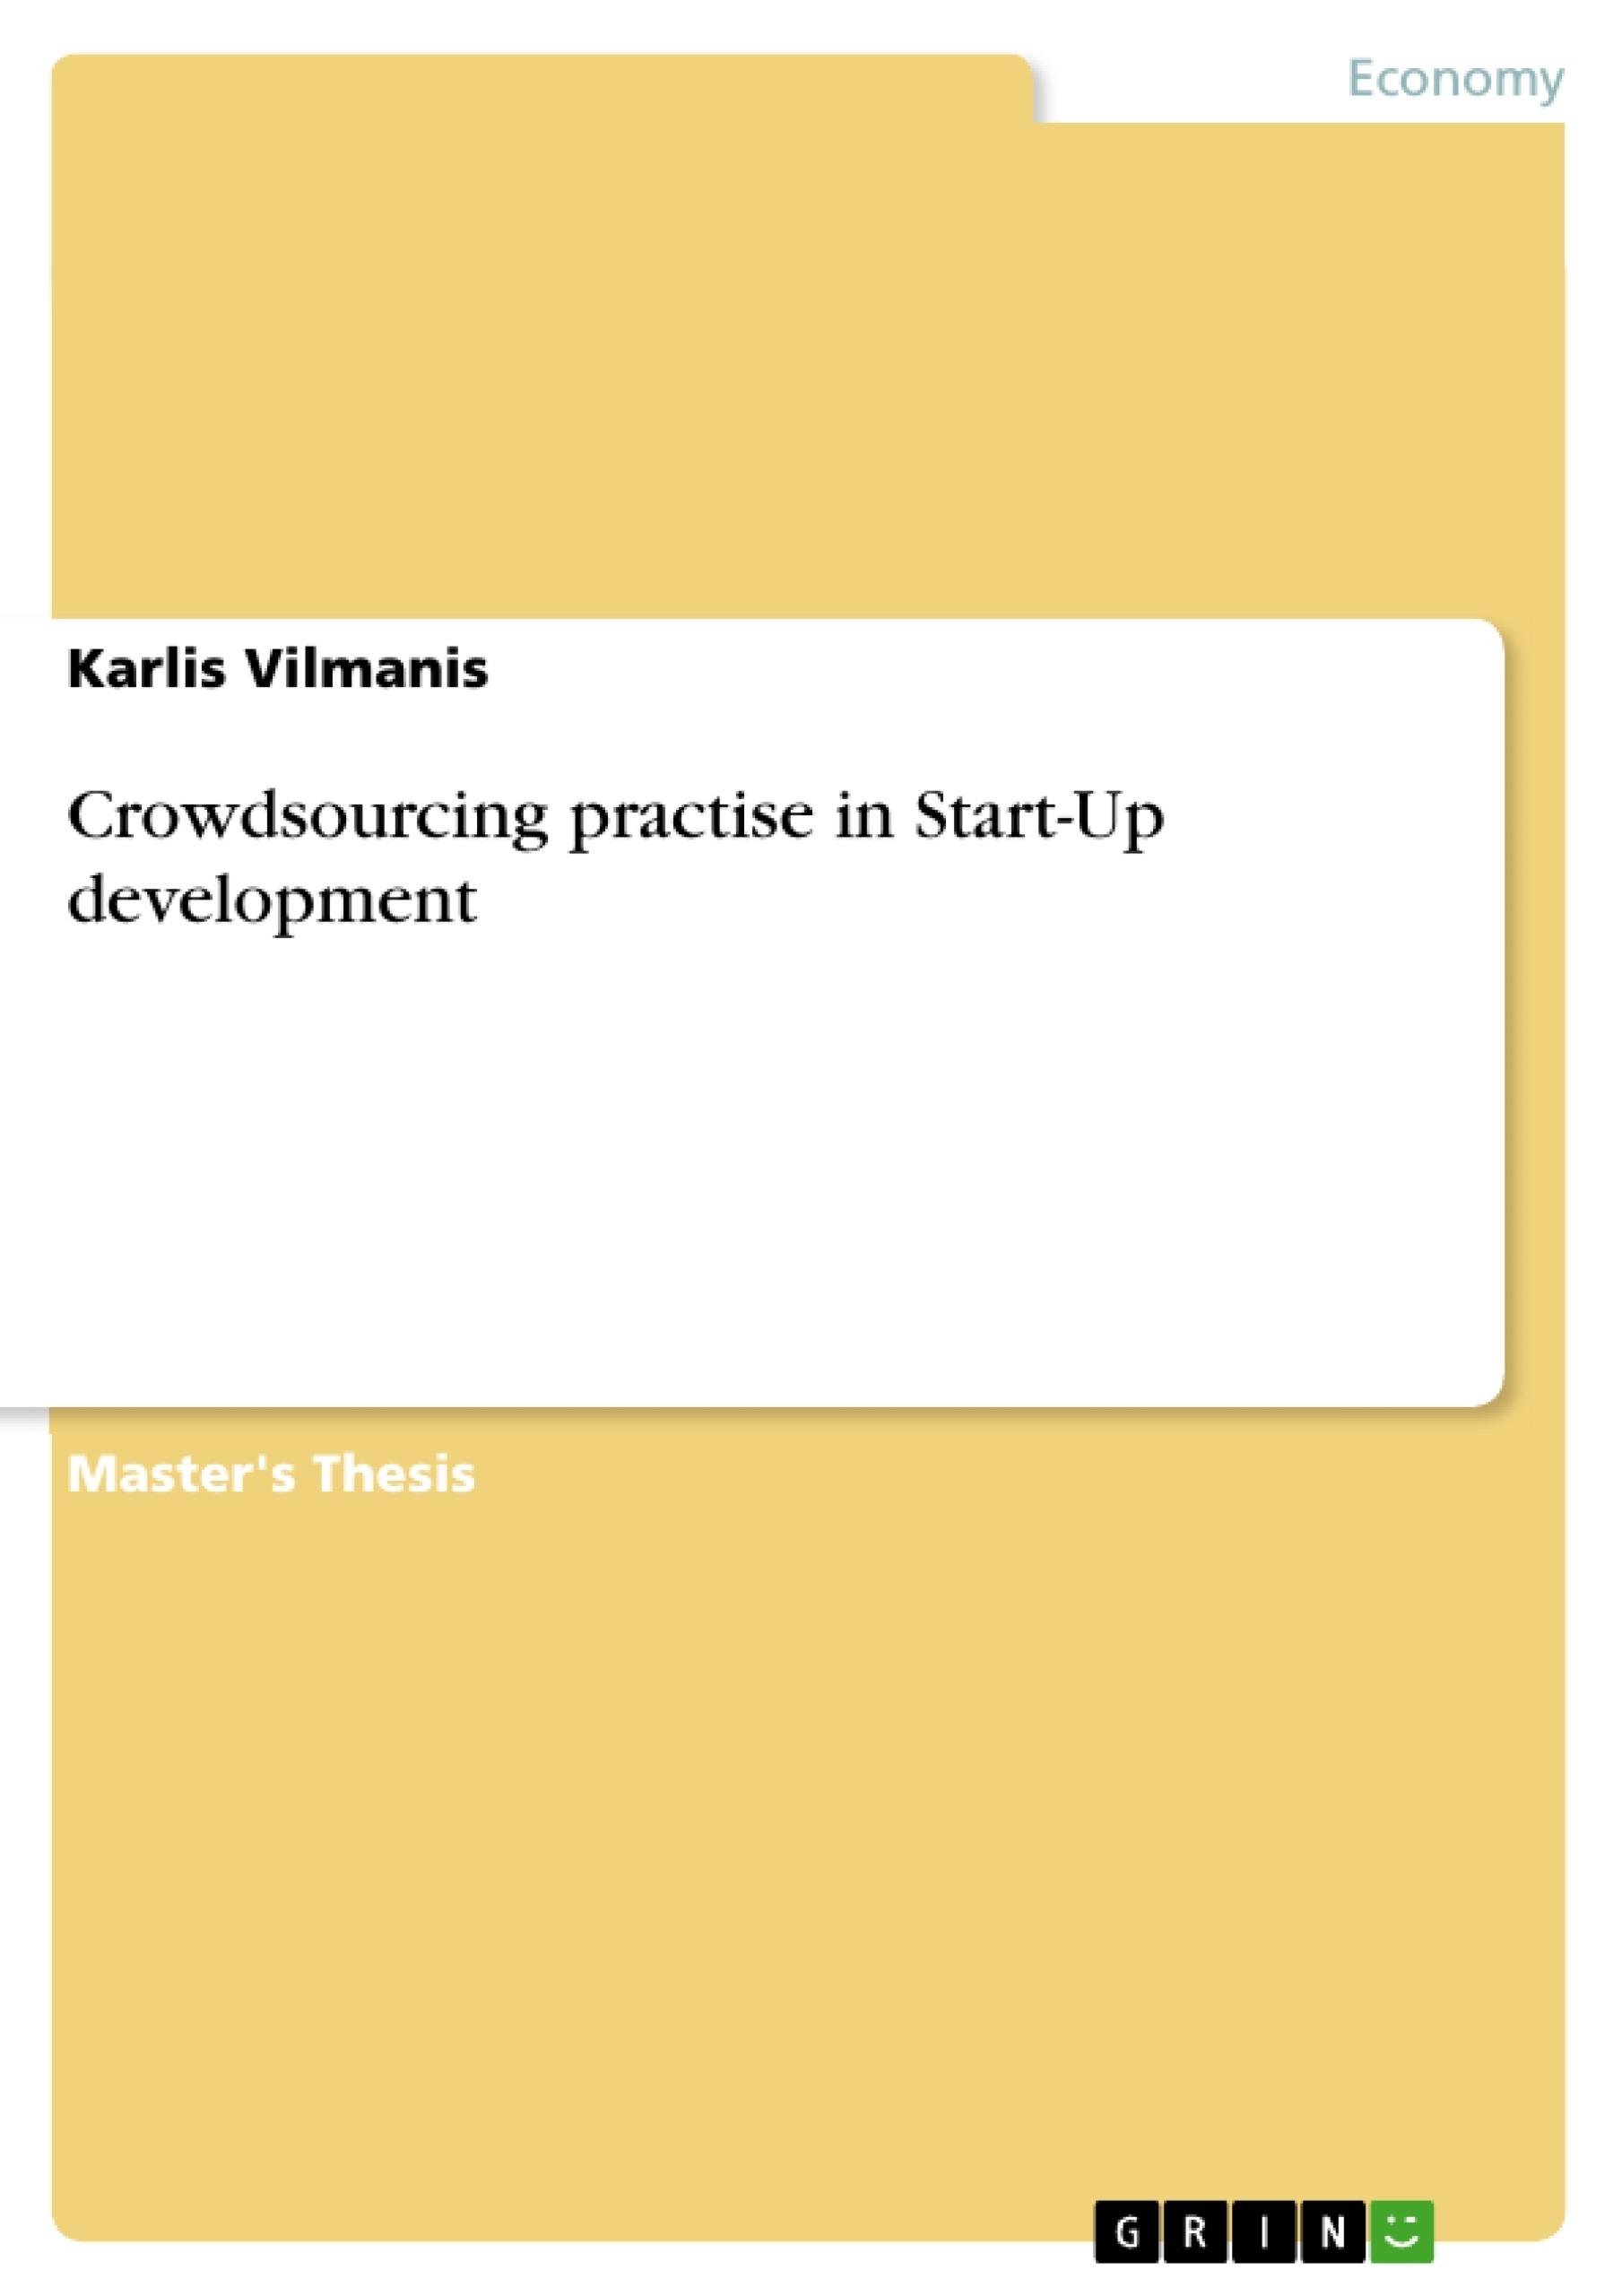 Title: Crowdsourcing practise in Start-Up development